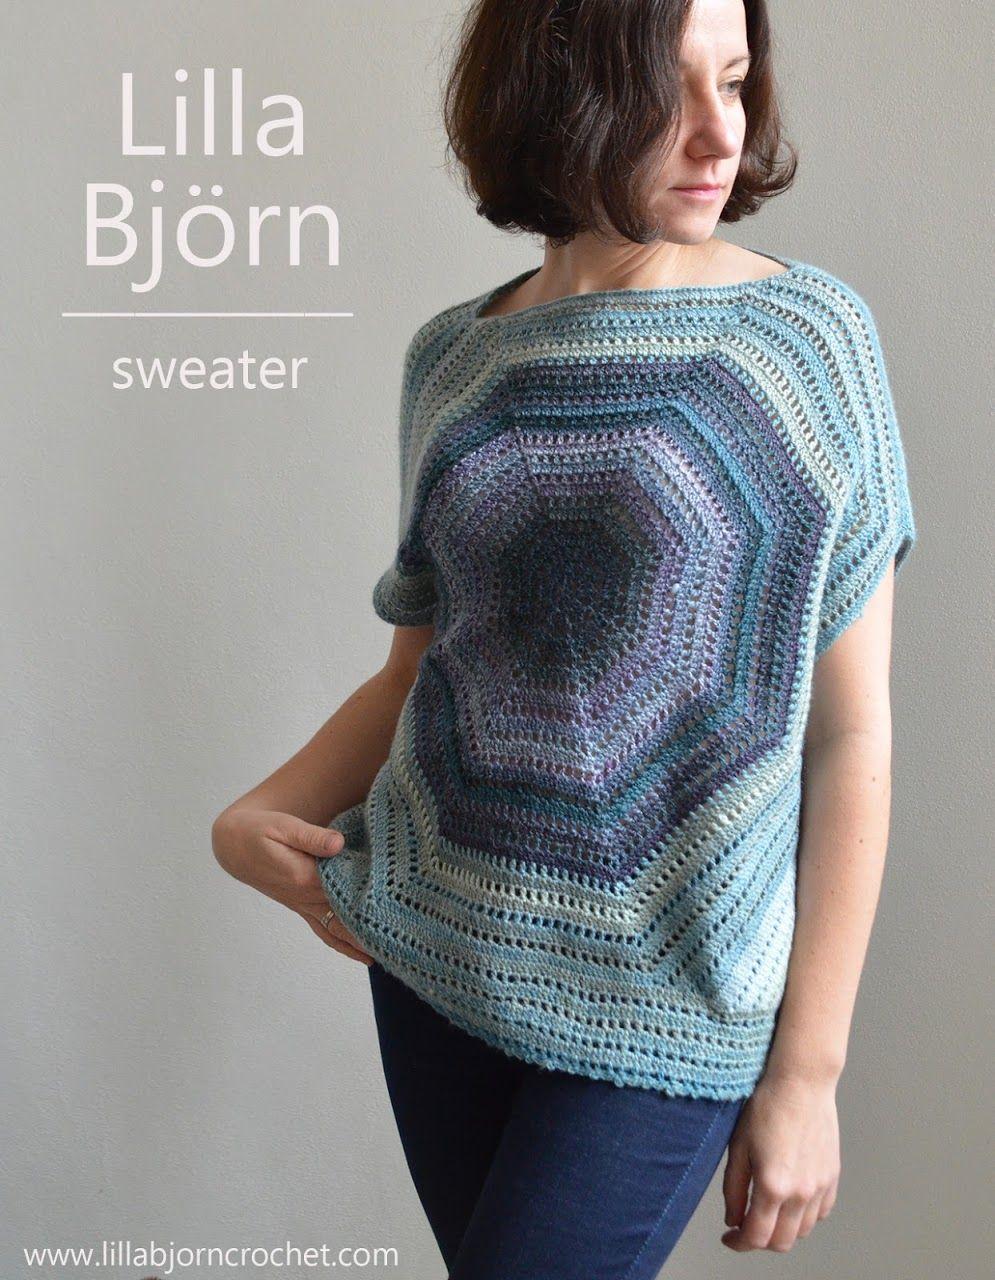 Lilla Björn Sweater: Reveal | Free crochet, Crochet and Shoulder